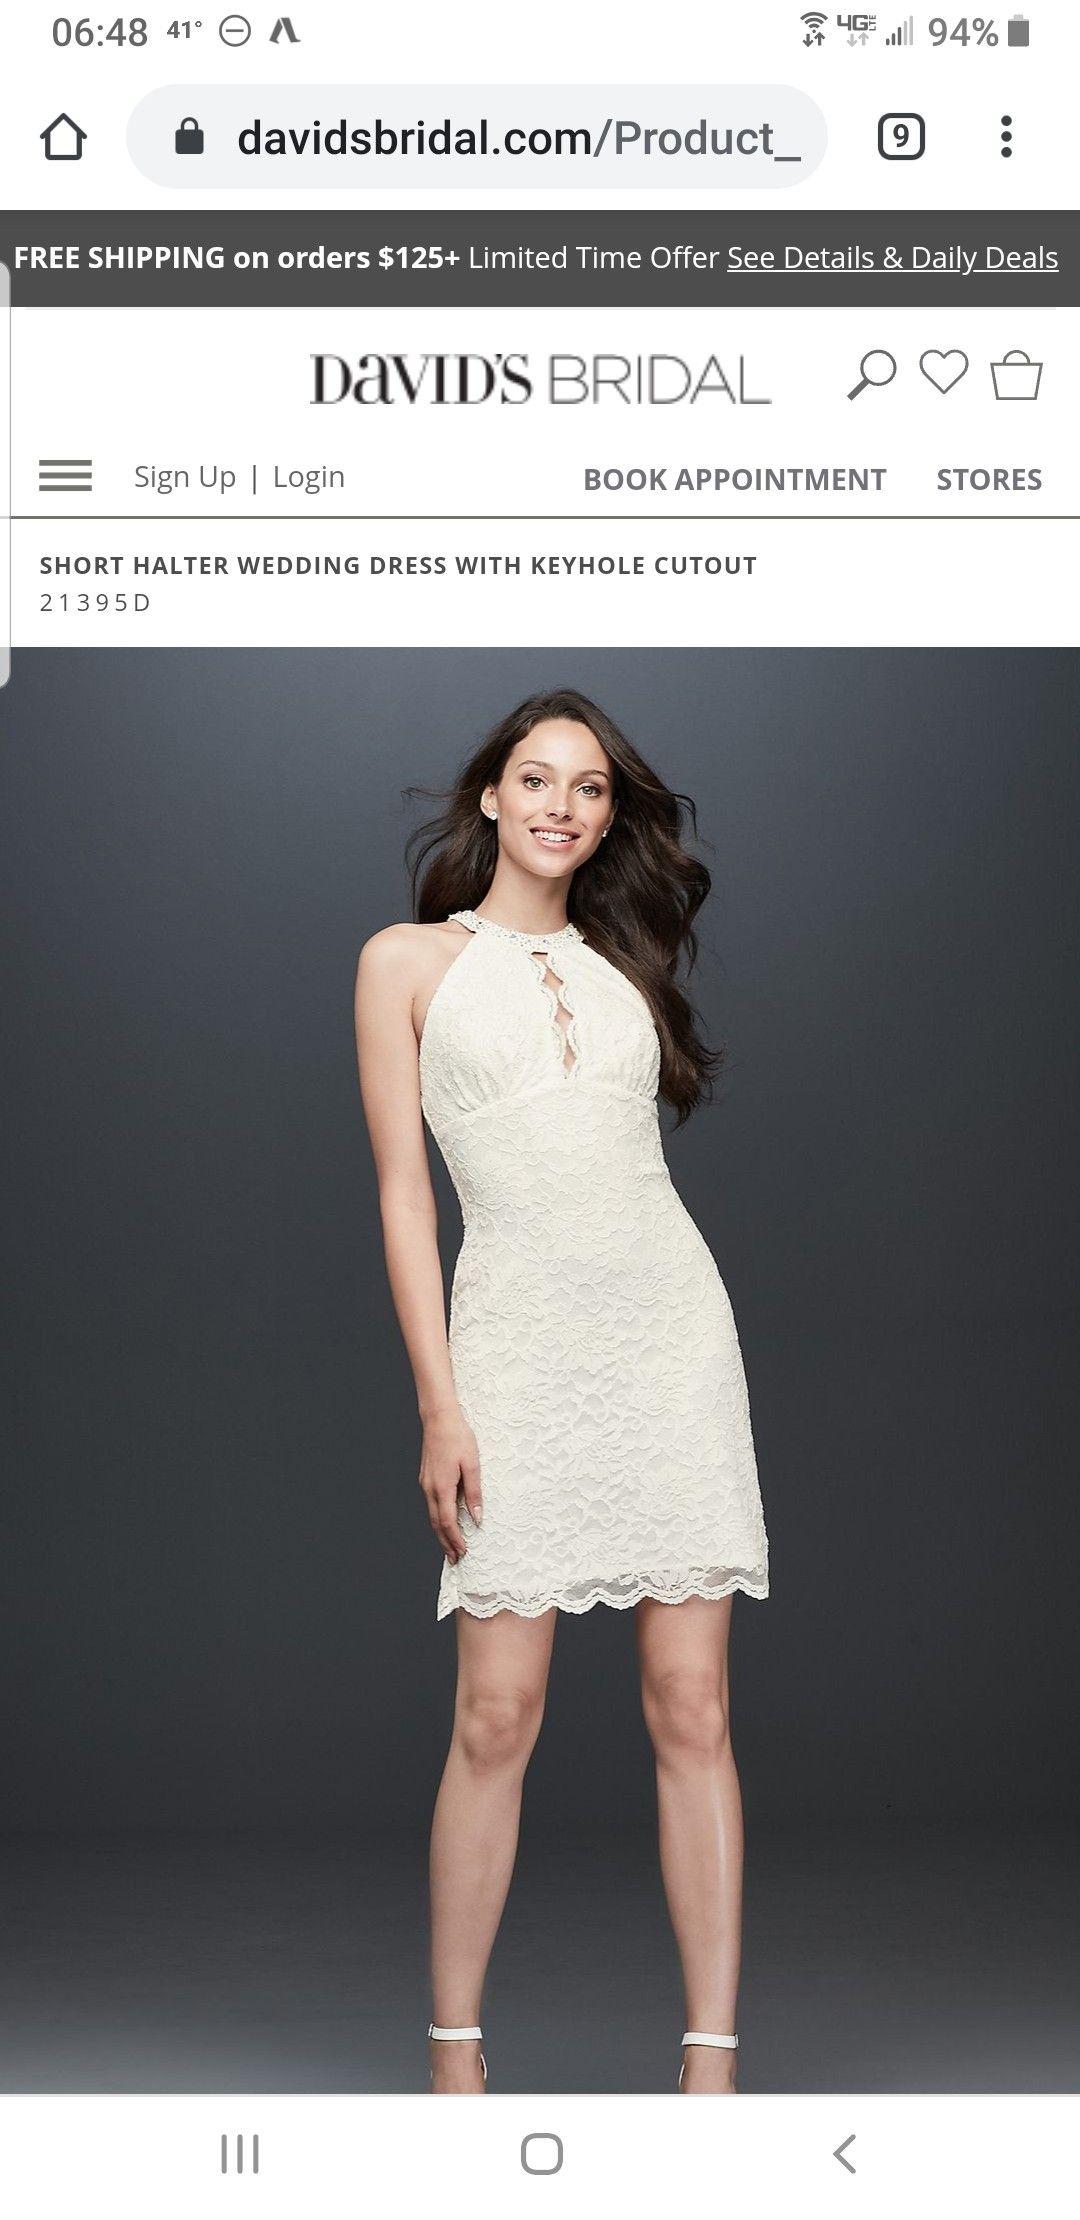 Pin By Karen Lintz On Wedding Short Halter Wedding Dress Halter Wedding Dress Dresses [ 2220 x 1080 Pixel ]